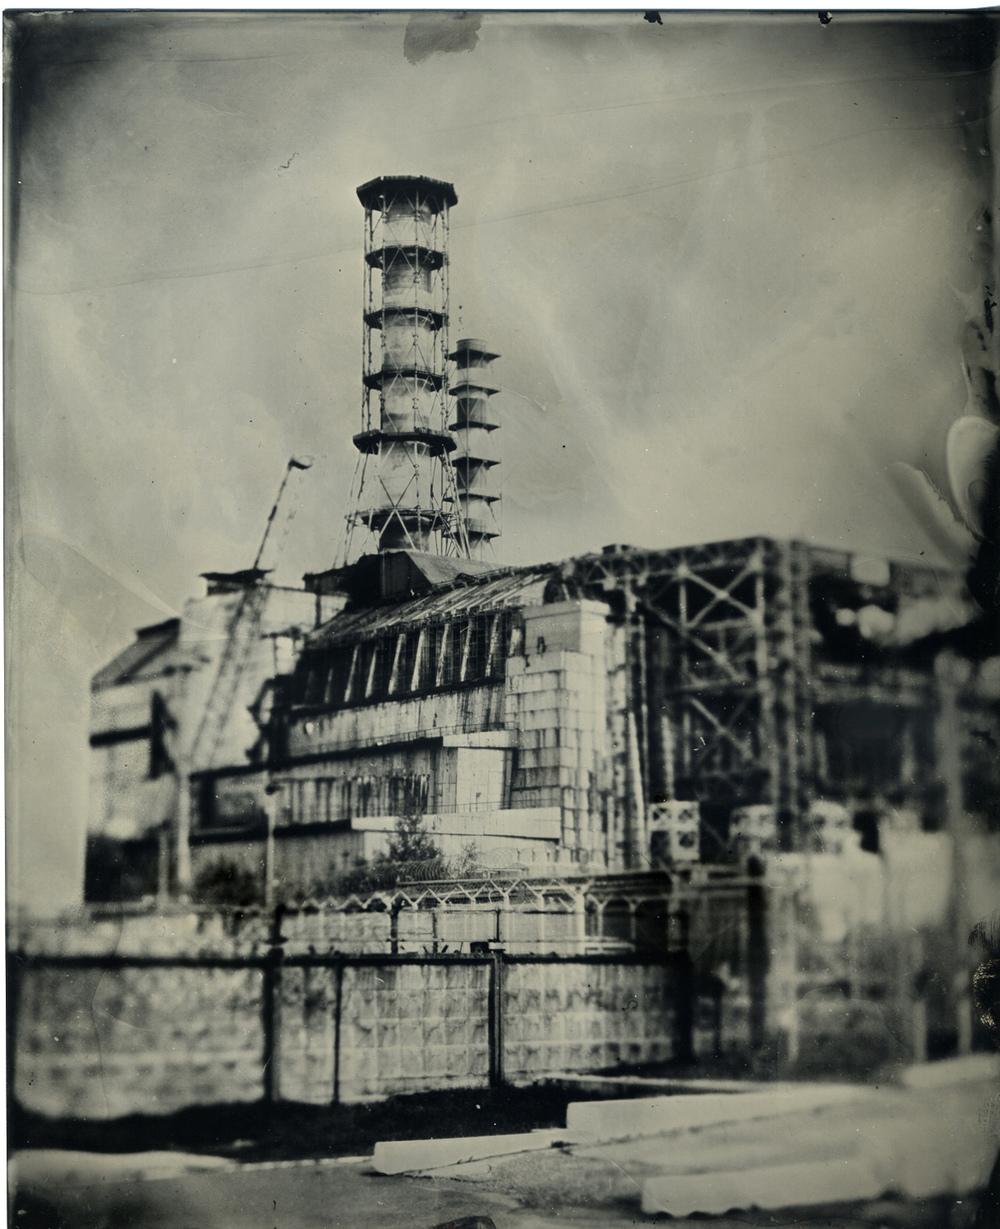 chernobyl copy.jpg